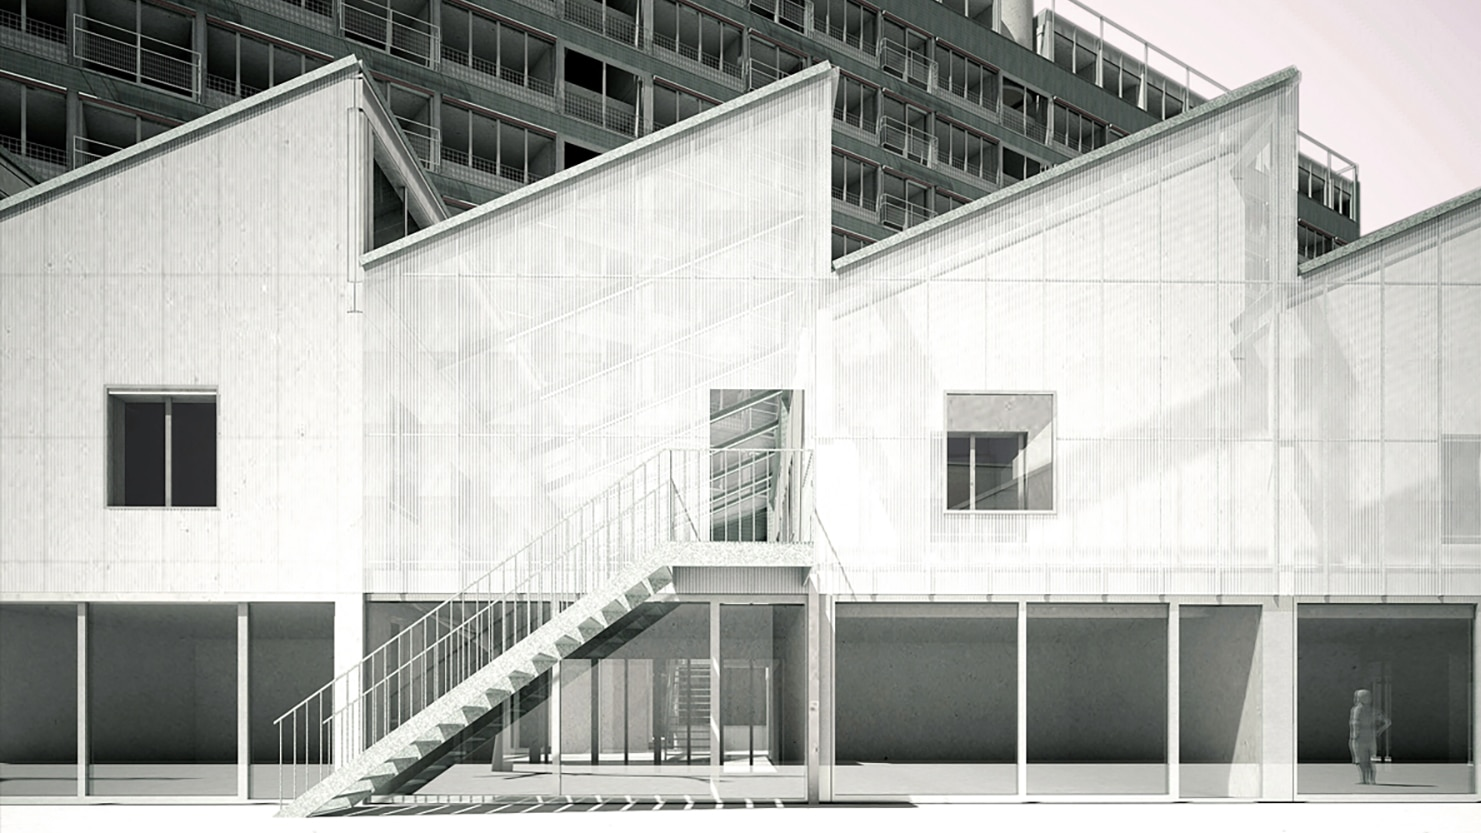 Visualisierung des Neubauprojekts Volta Ost.